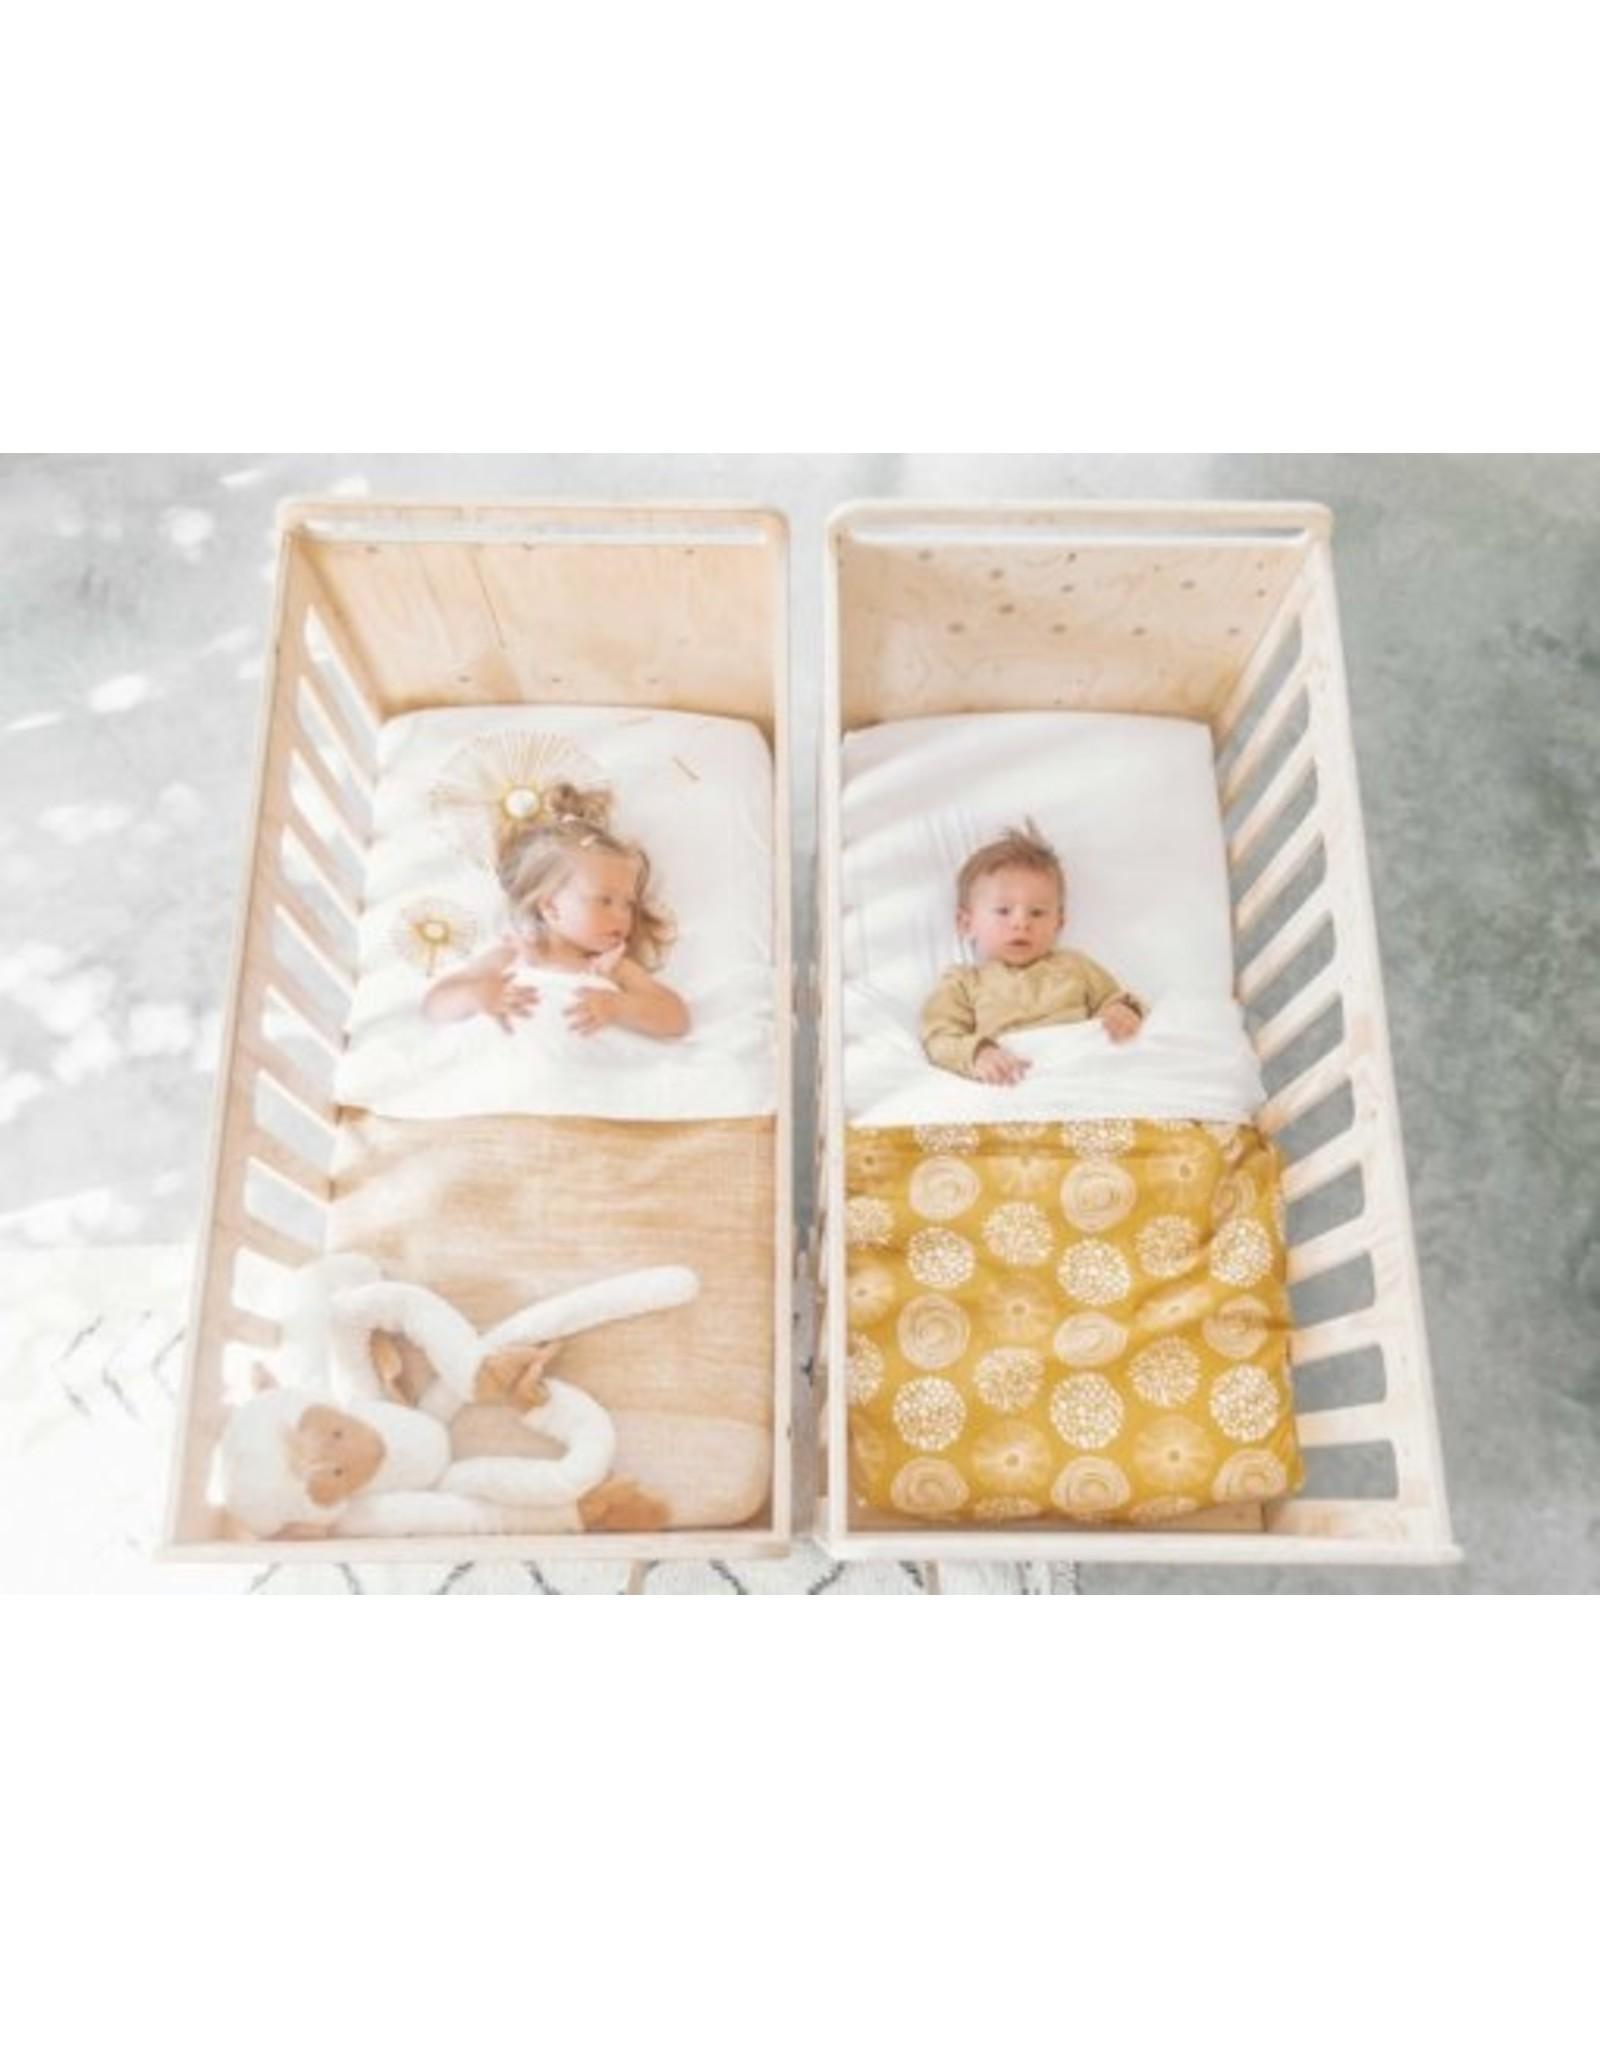 Witlof for Kids Witlof for Kids Ledikanthoeslaken Sparkle Sweet Honey